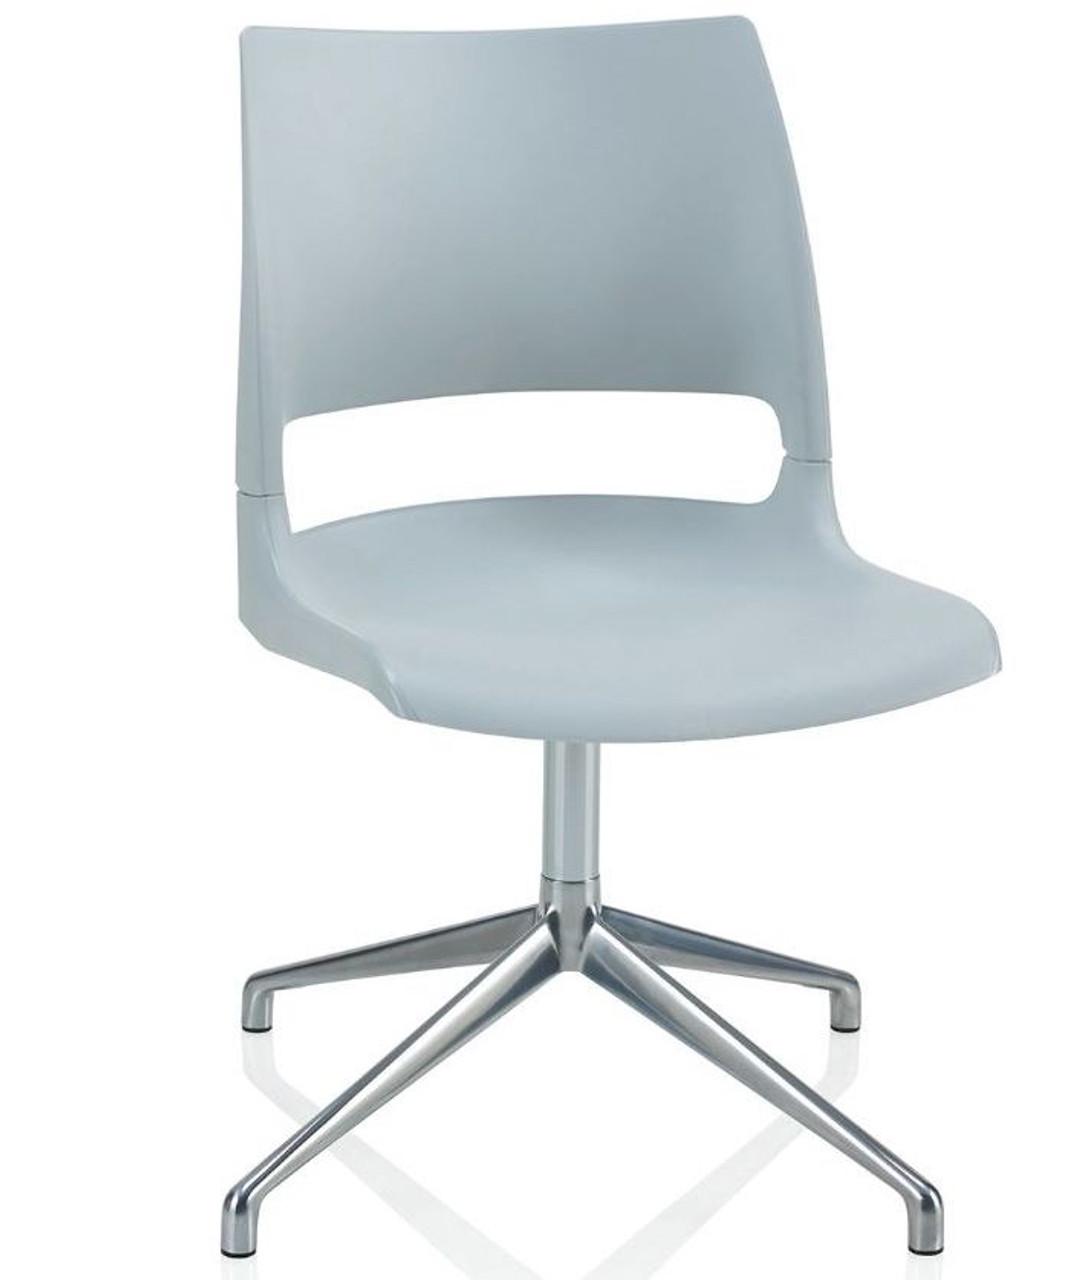 Pleasant Ki Doni Polypropylene Swivel Guest Chair Dnx100 Theyellowbook Wood Chair Design Ideas Theyellowbookinfo